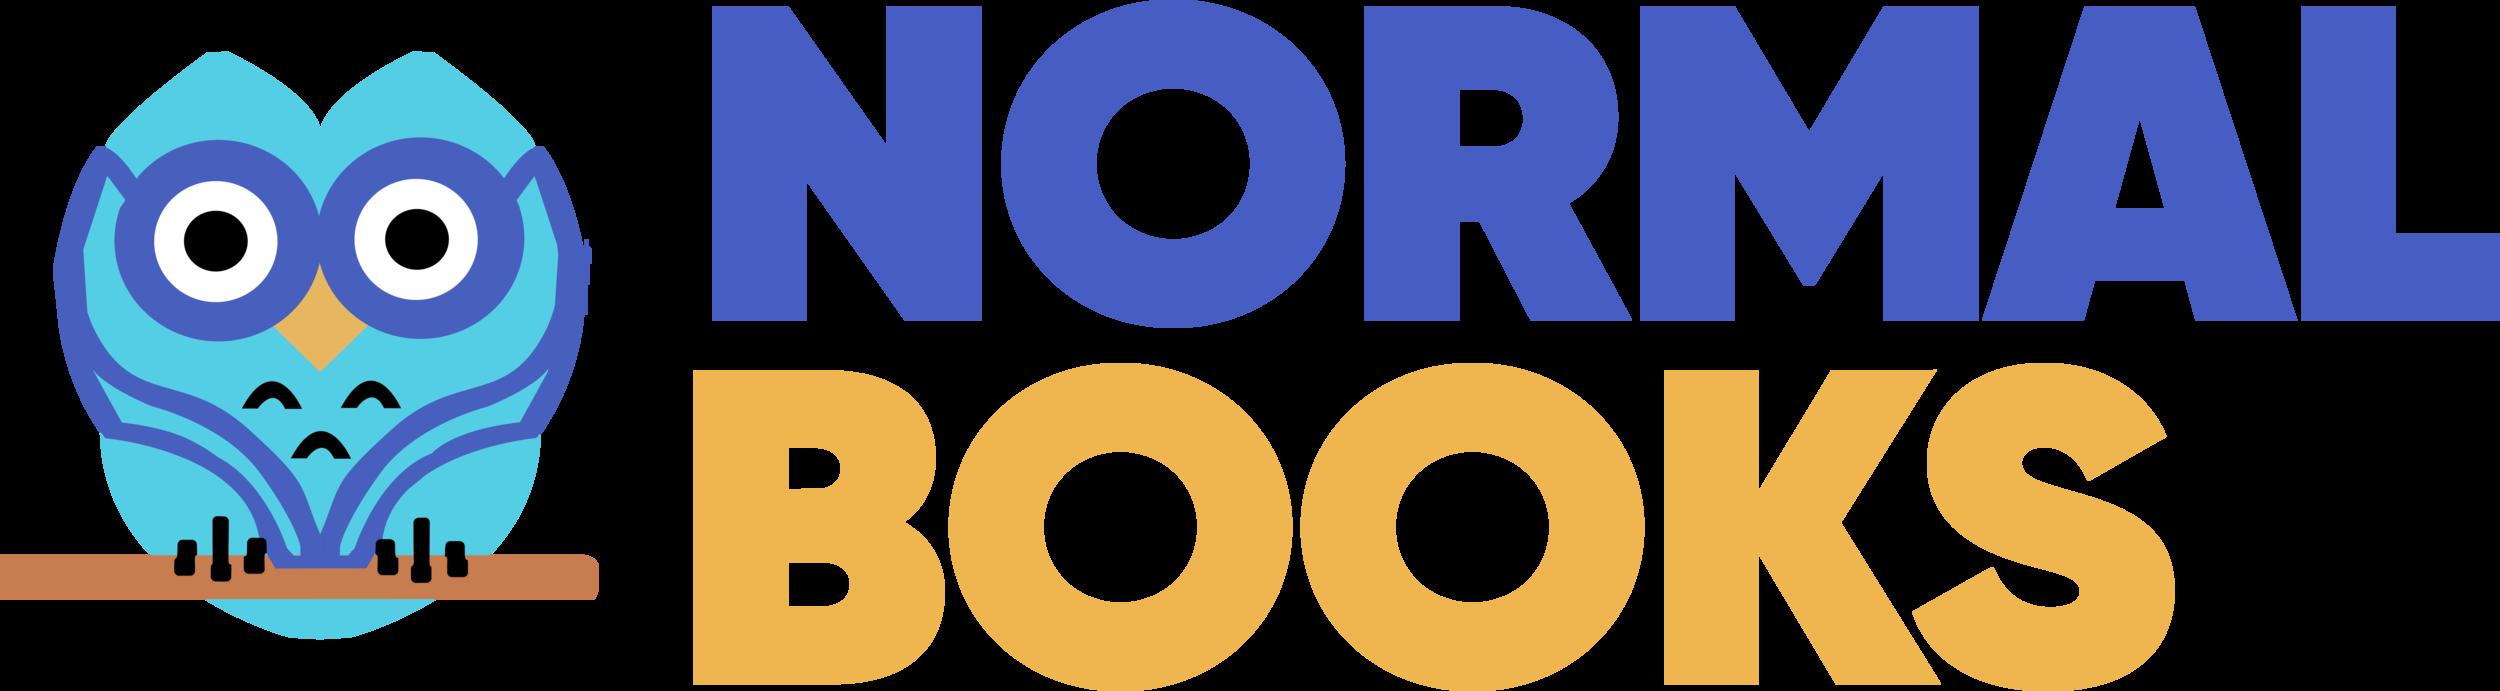 NormalBooksLogo_finalfinal.png